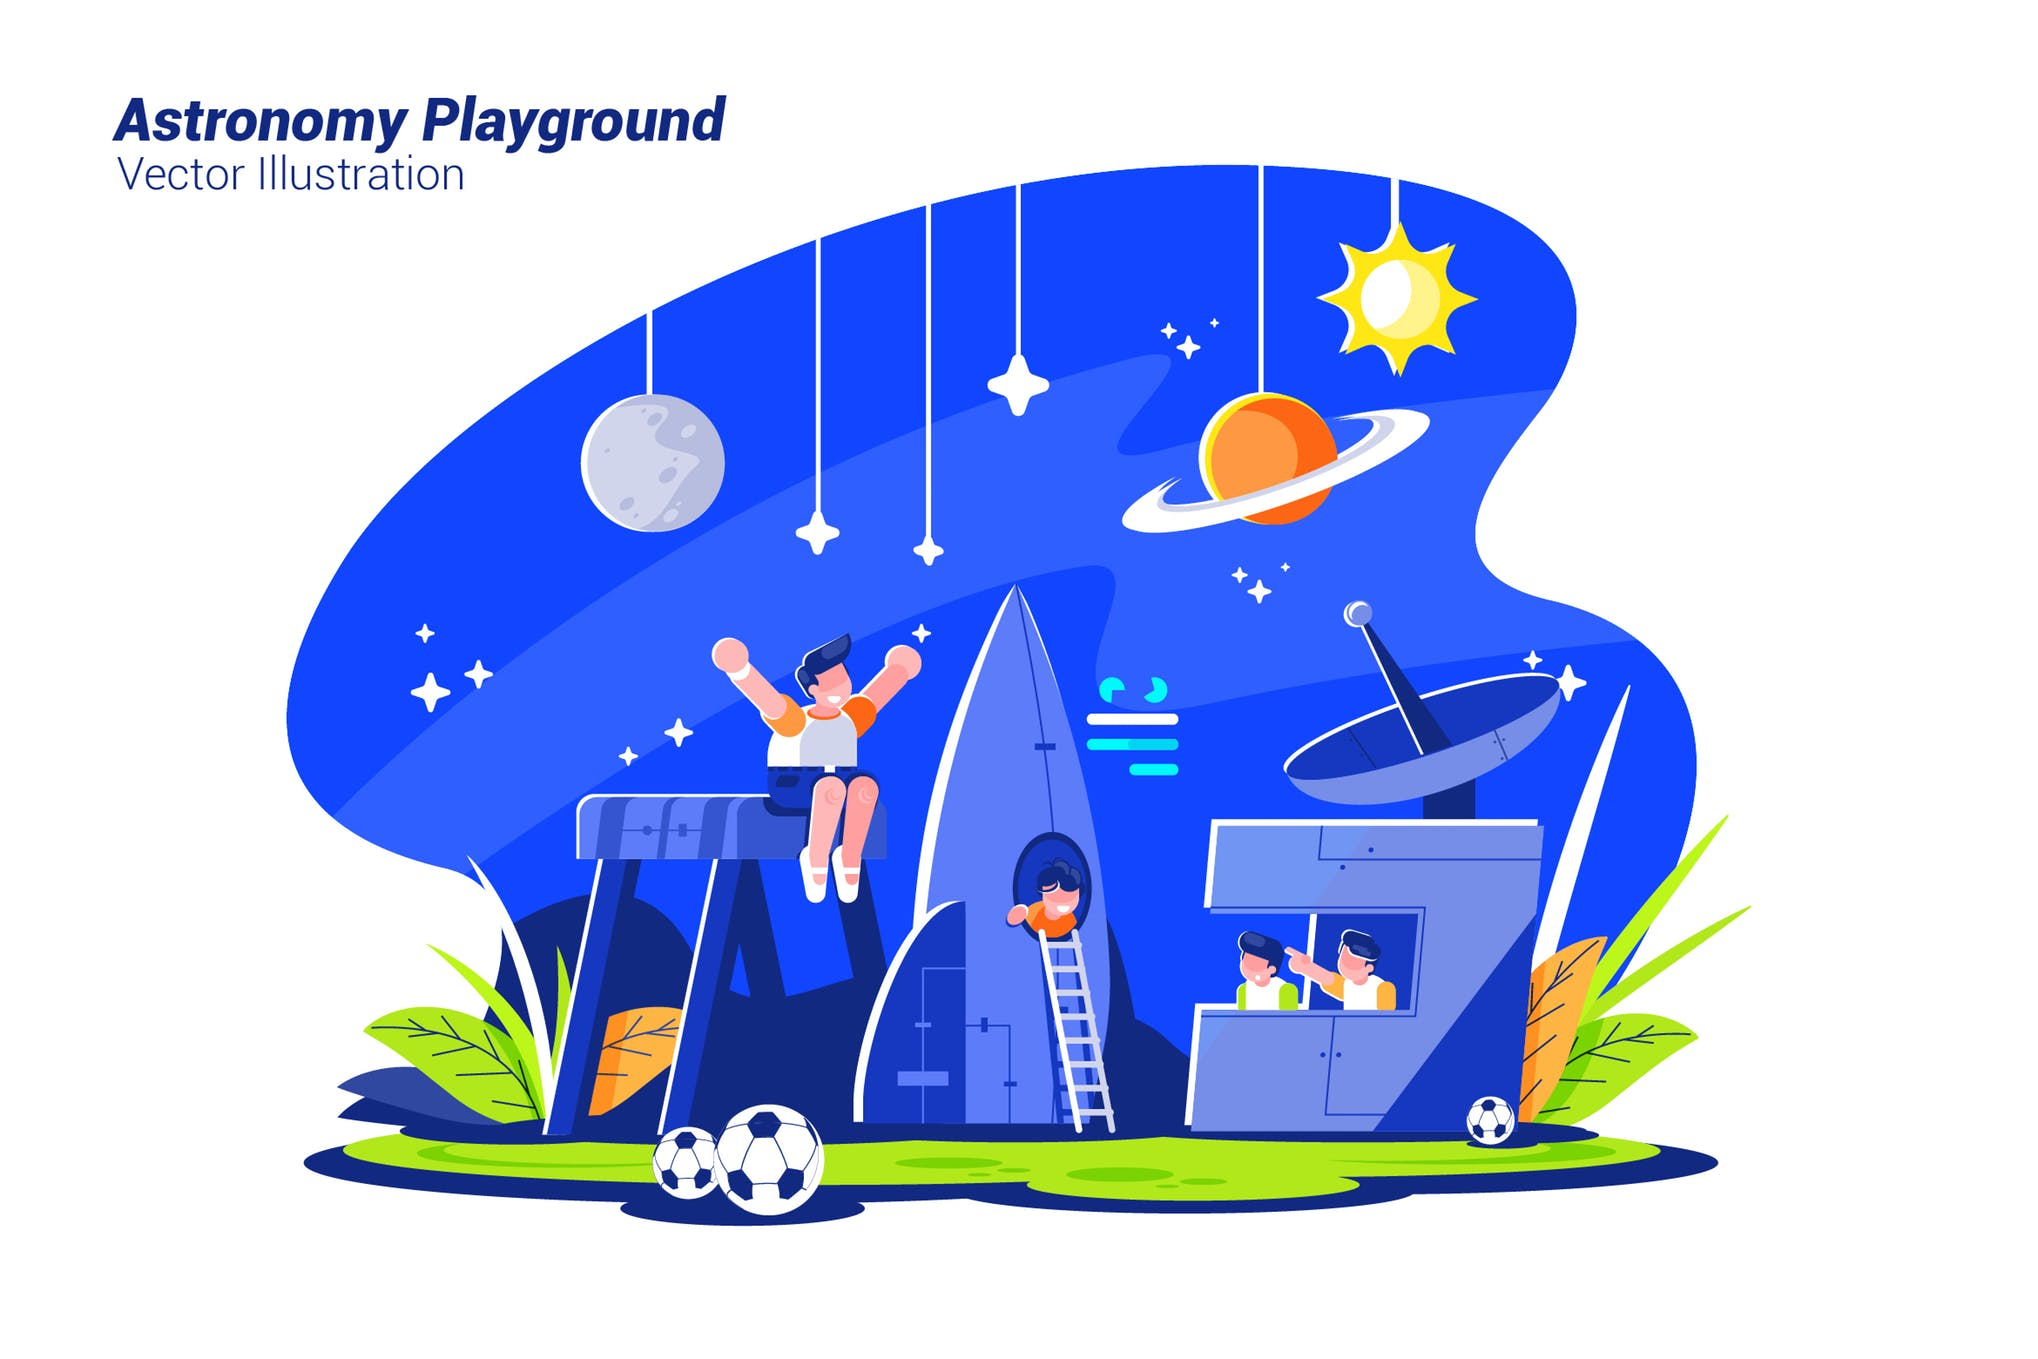 天文游乐场场景插画素材下载Astronomy Playground - Vector Illustration